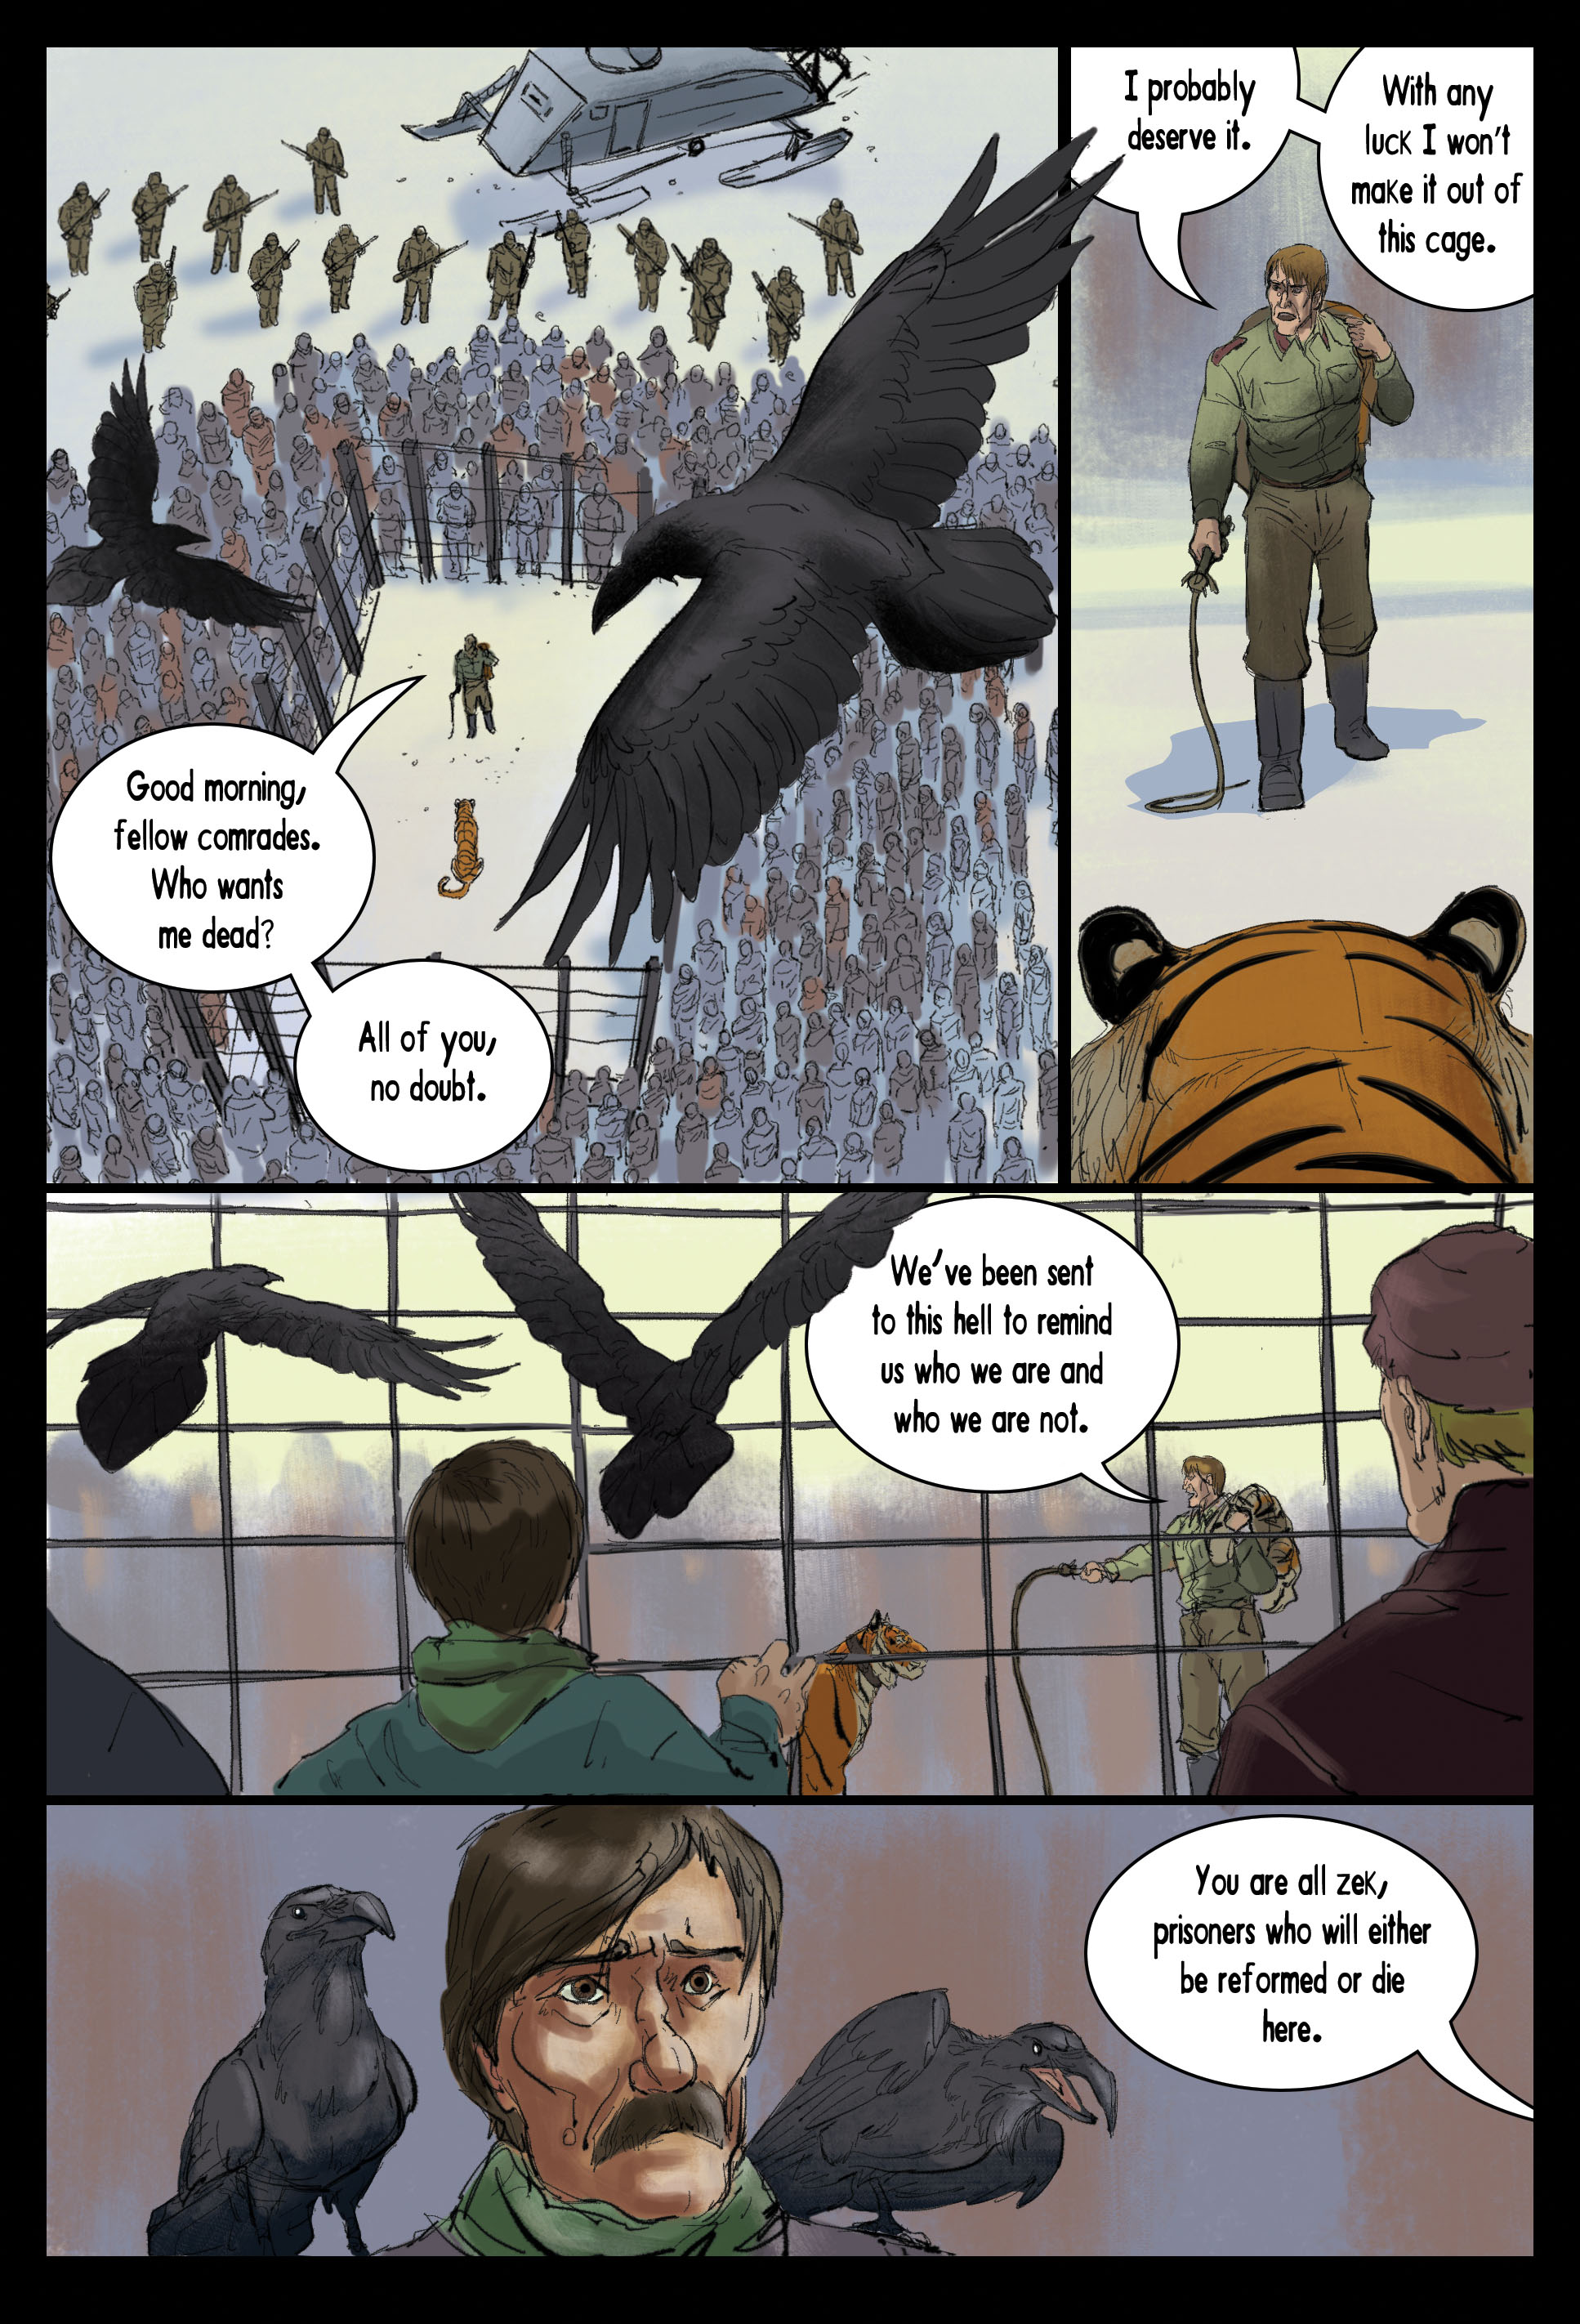 Gulag_Web168.jpg